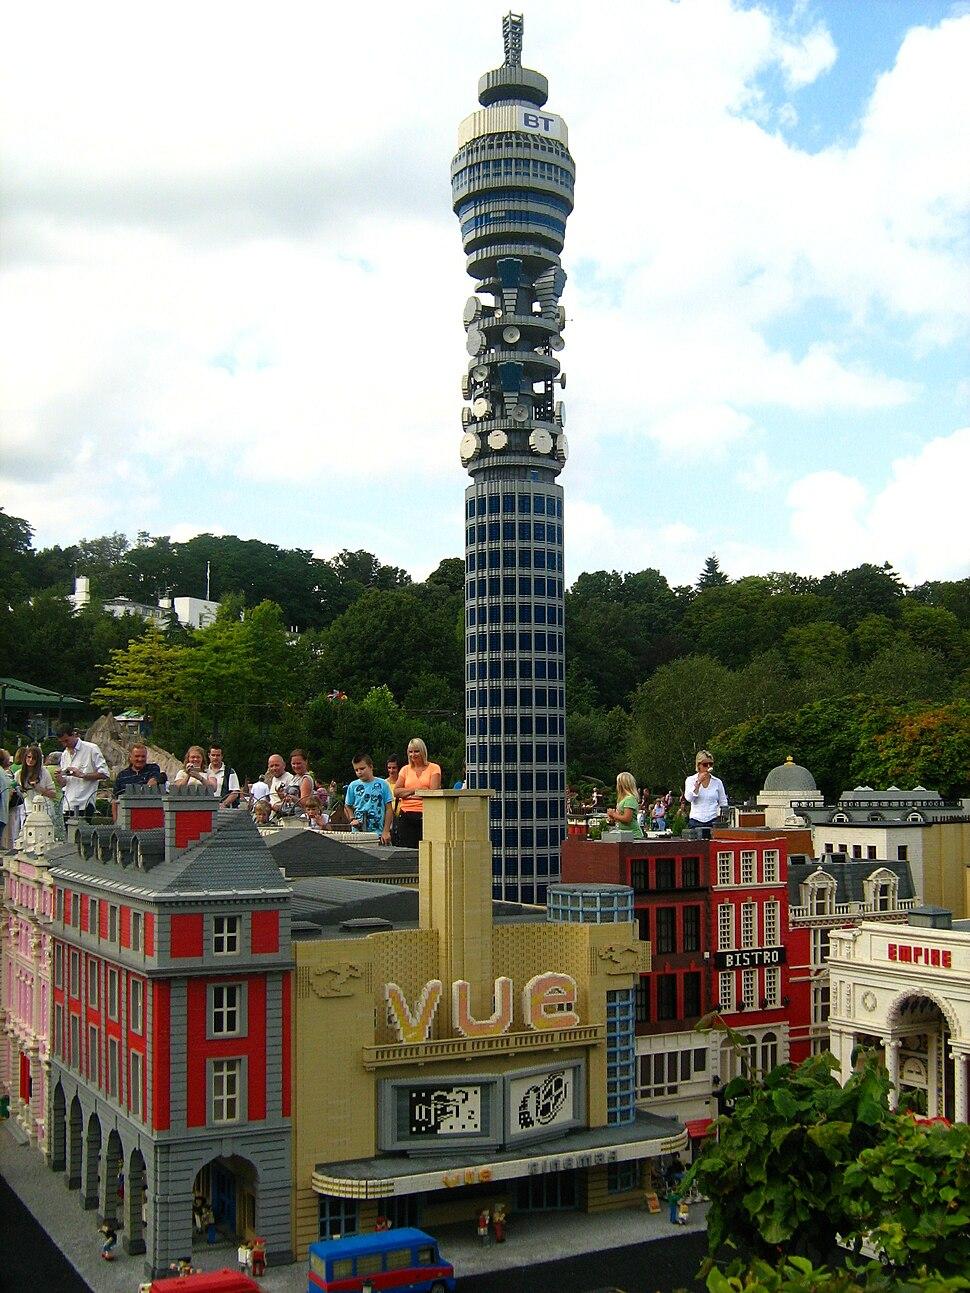 Model of BT Tower in Miniland, Legoland Windsor